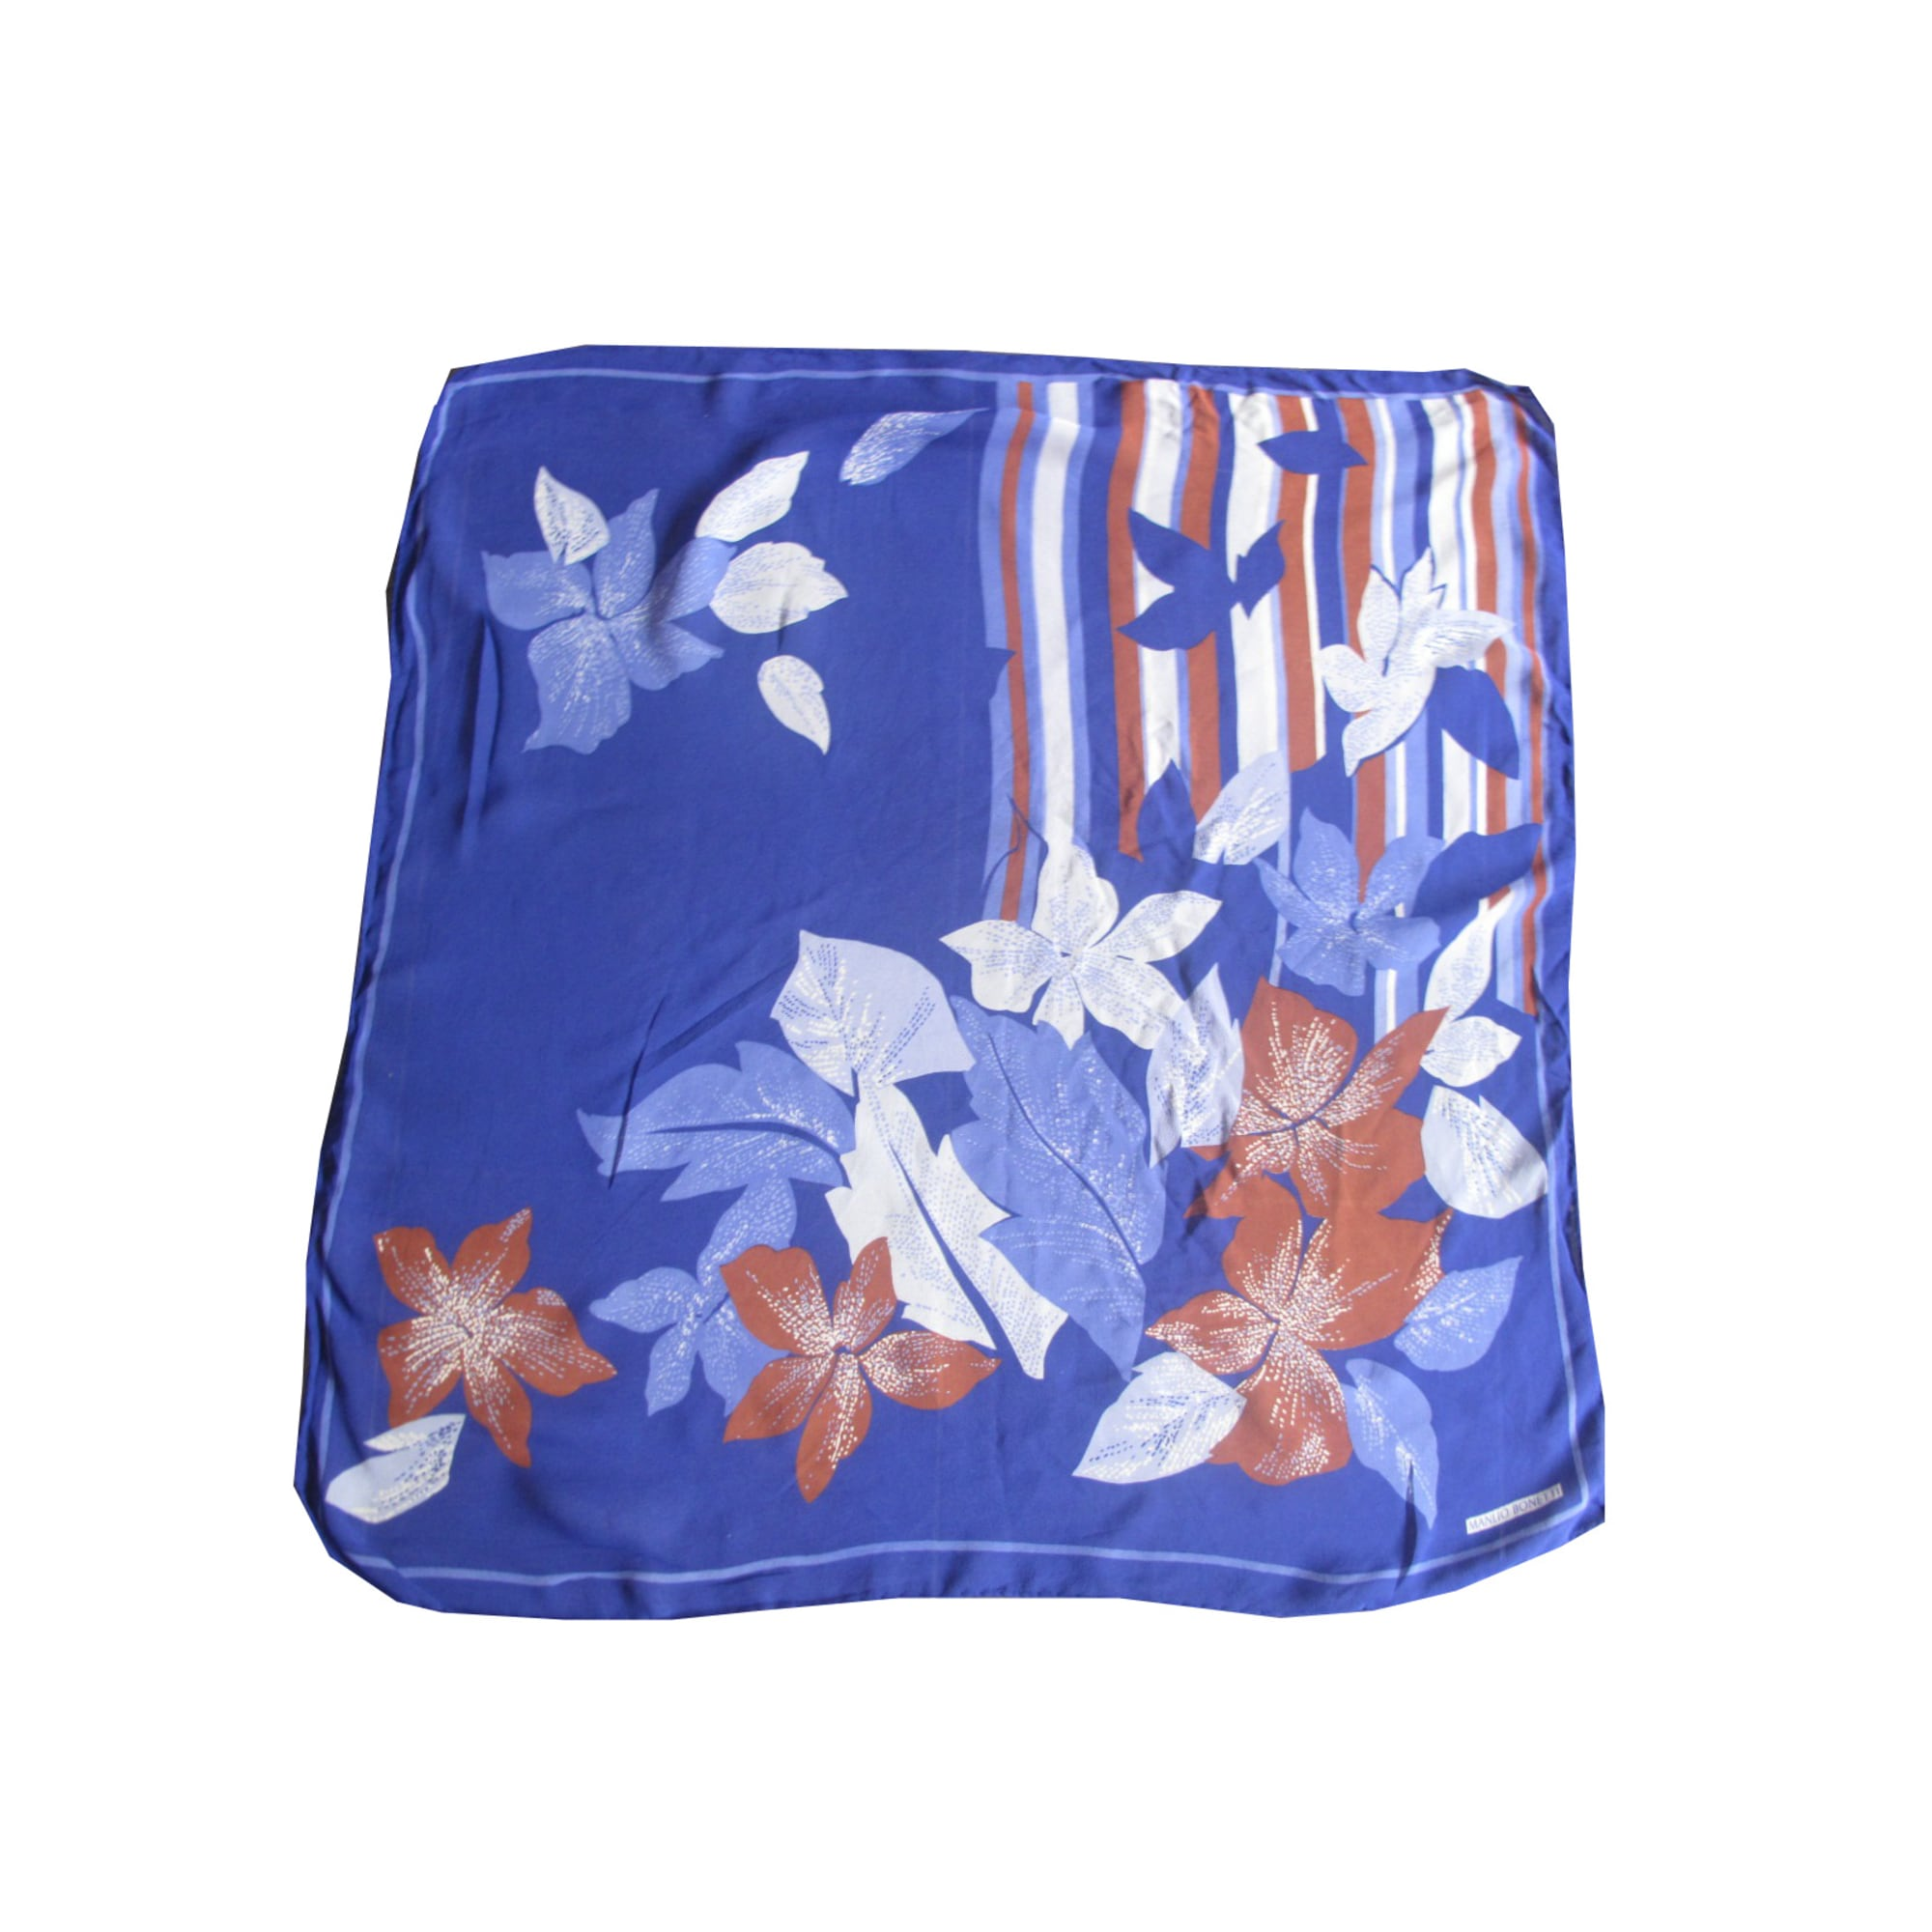 Foulard MANLIO BONETTI Bleu, bleu marine, bleu turquoise